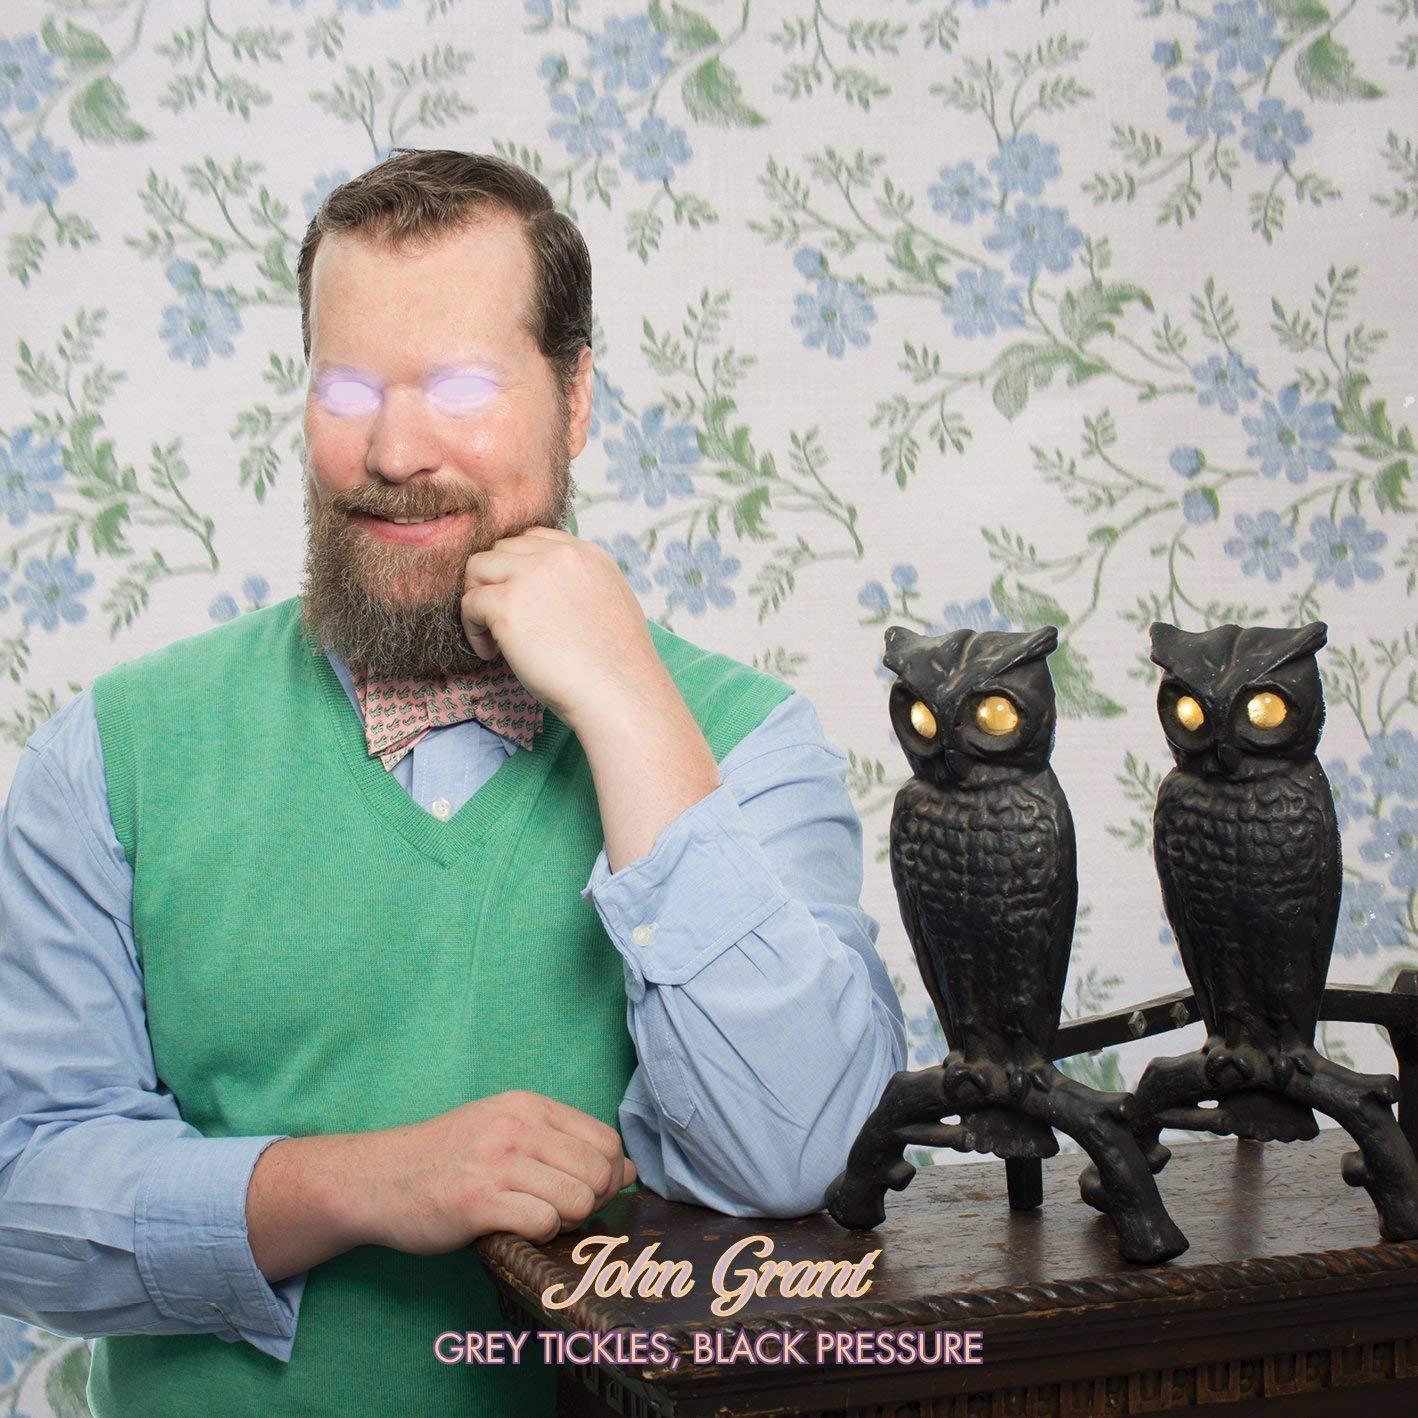 Джон Грант John Grant. Grey Tickles, Black Pressure (2 LP) cкакалка nike weighted rope 2 0 ns grey black bright citrus